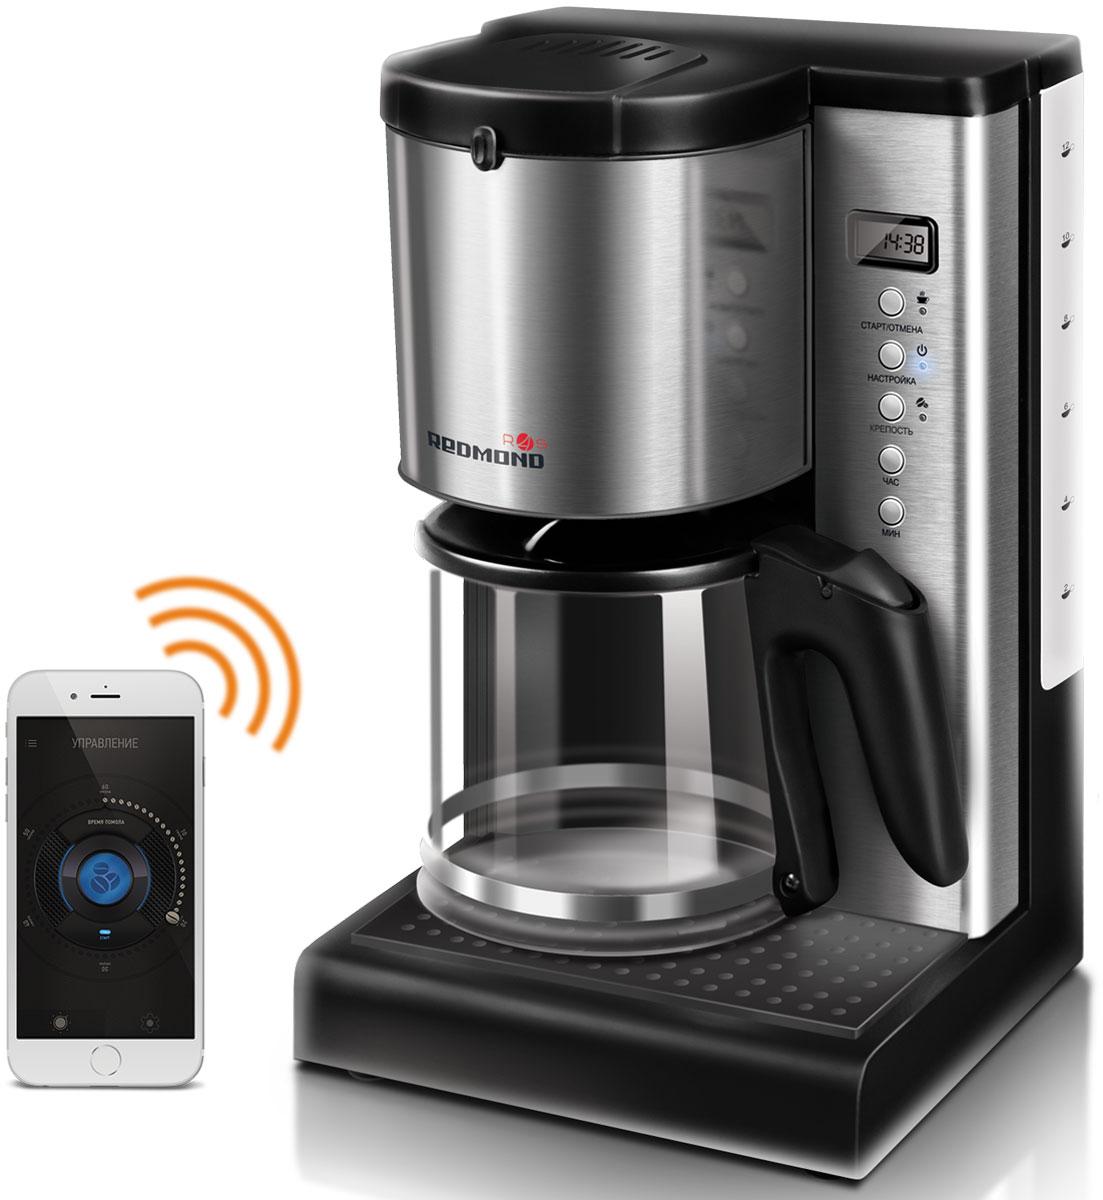 Redmond SkyCoffee RCM-M1509S умная кофеварка кофеварка redmond rcm m 1509 s skycoffee